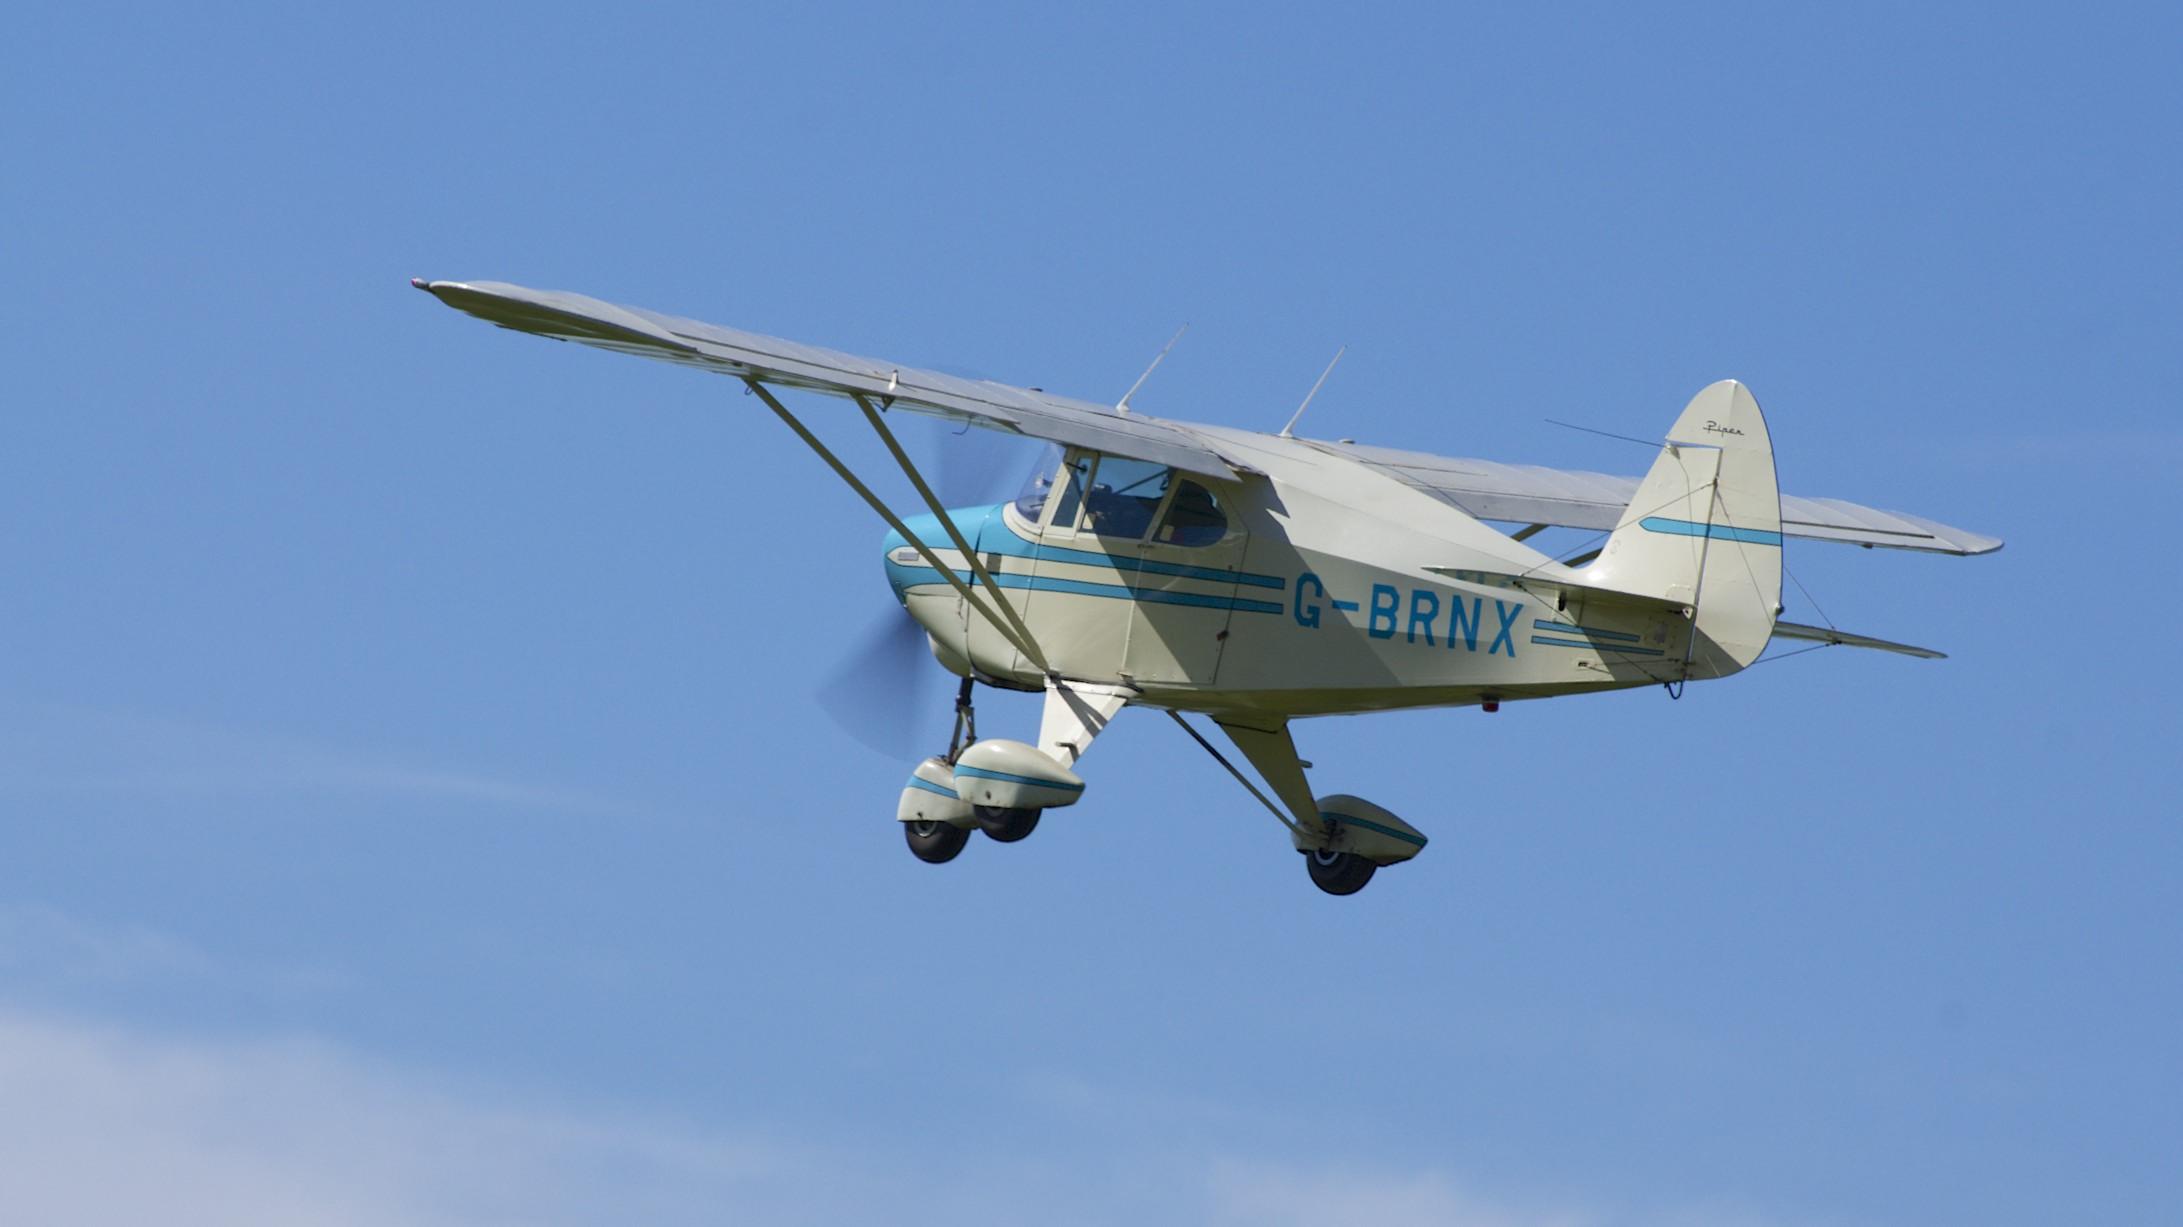 File:1955 Piper PA-22-150 Tri-Pacer Caribbean G-BRNX